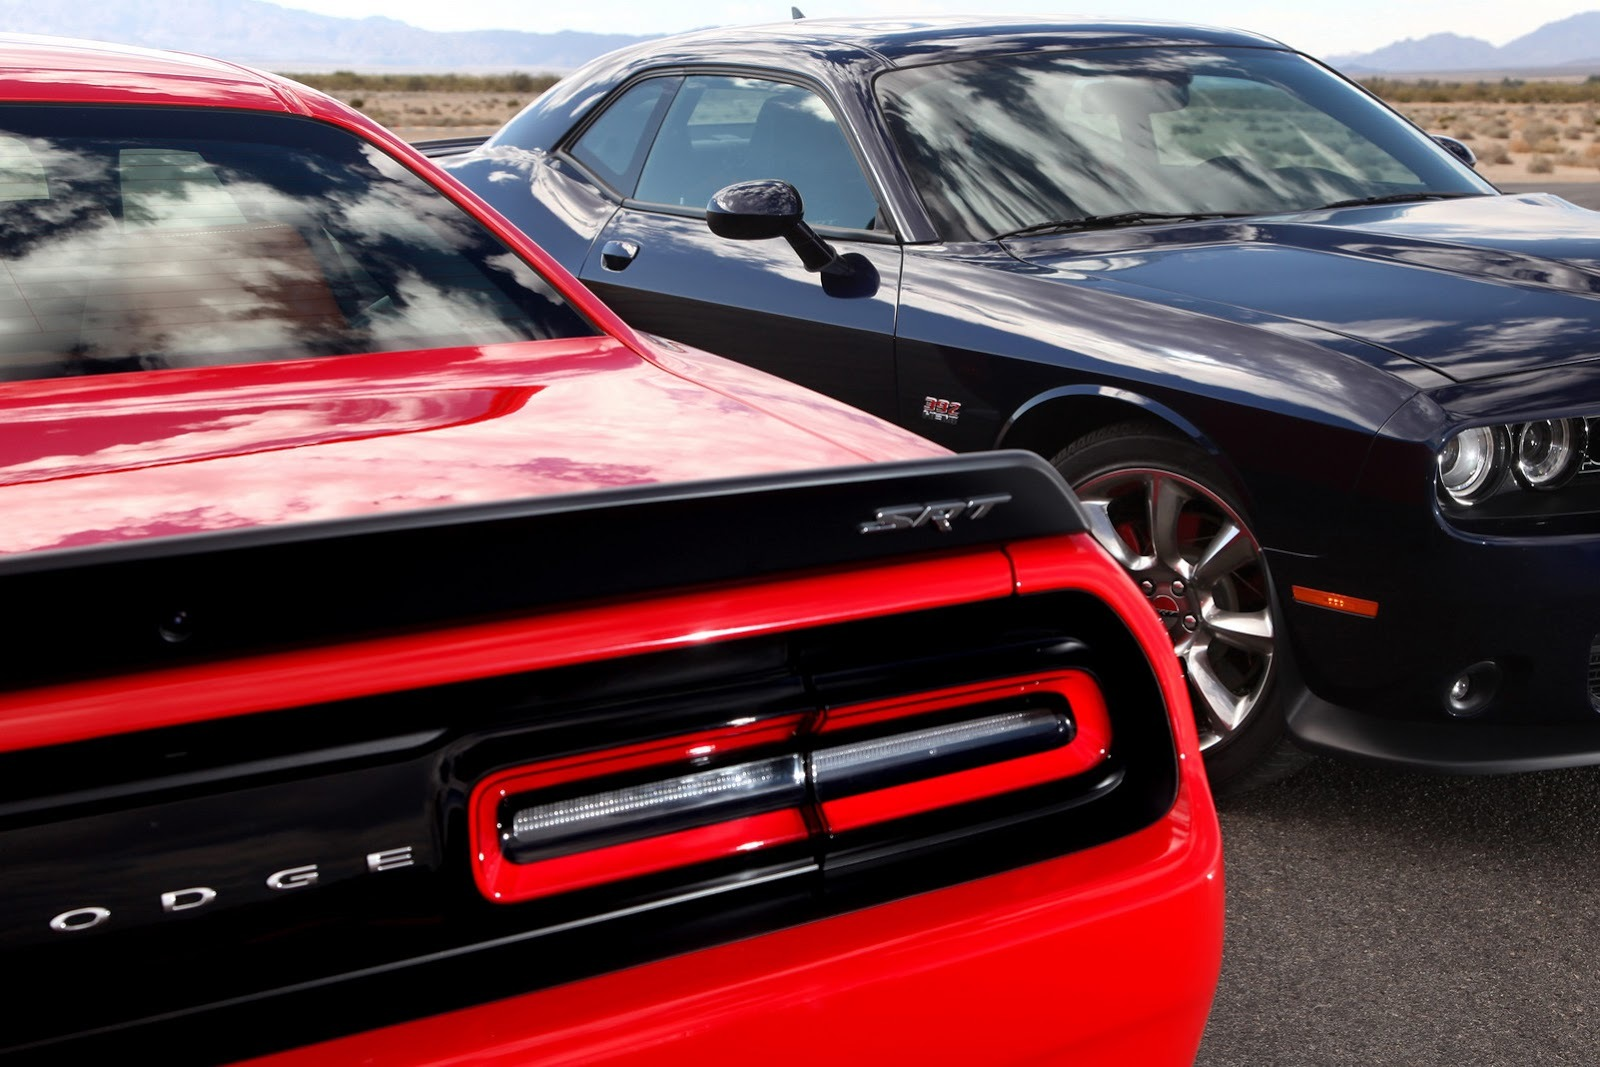 24 fotos más de Dodge Challenger SRT Hellcat